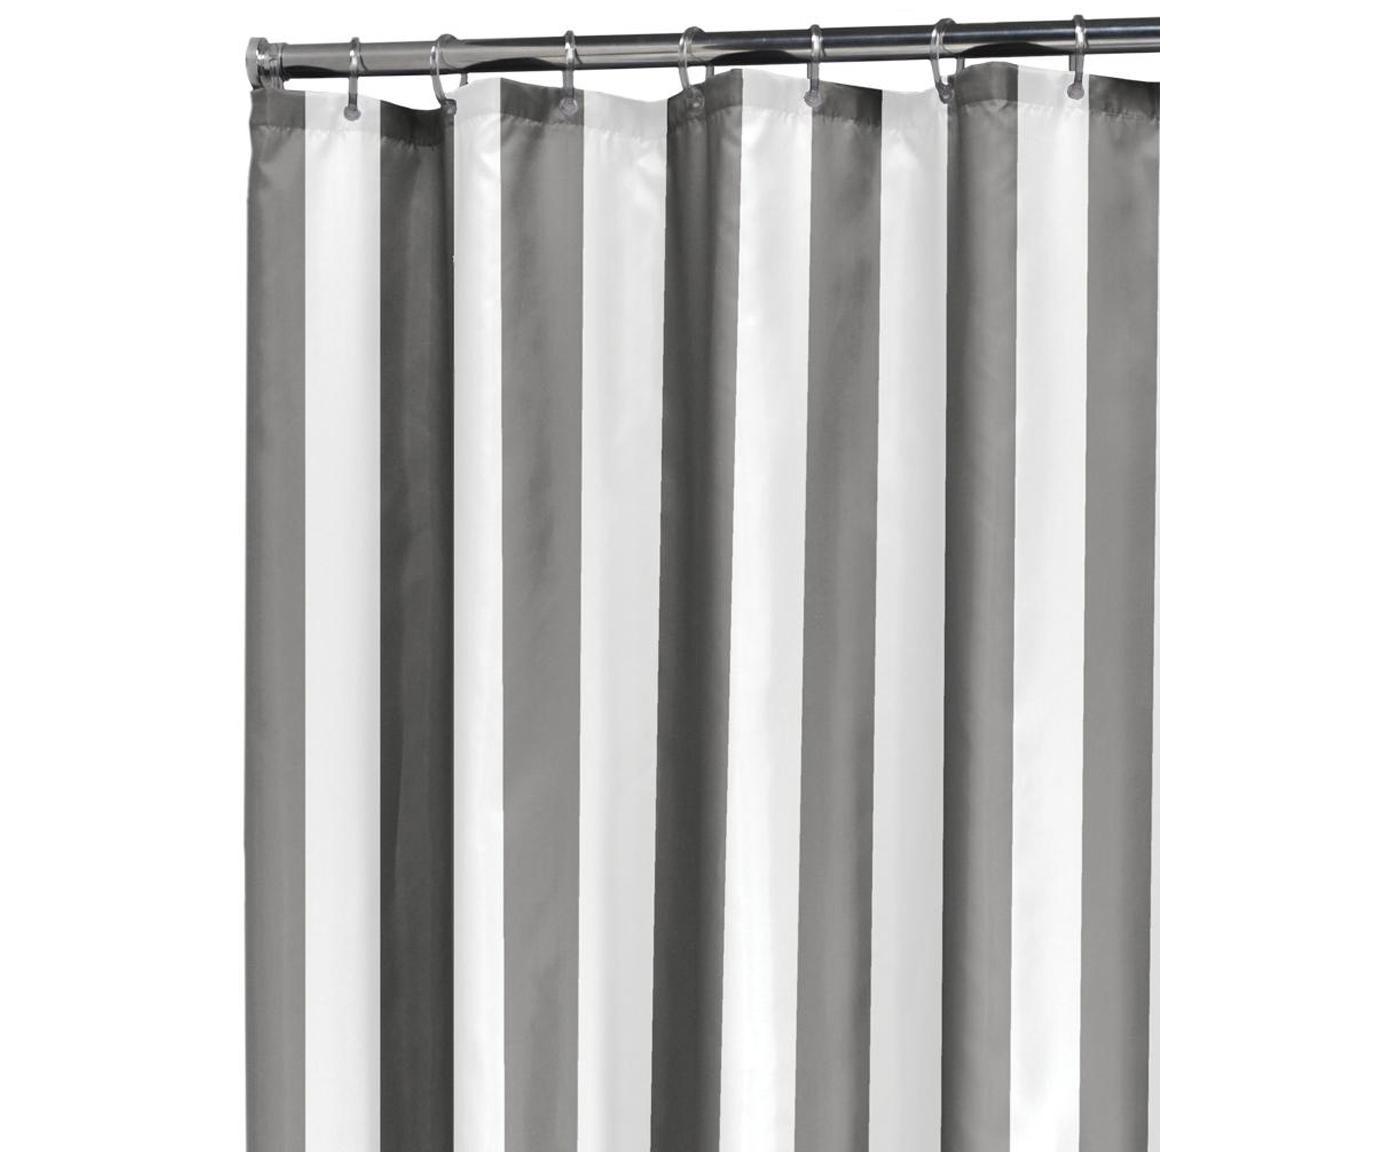 Cortina de baño Maggie, Ojales: metal, Gris, blanco, An 180 x L 200 cm